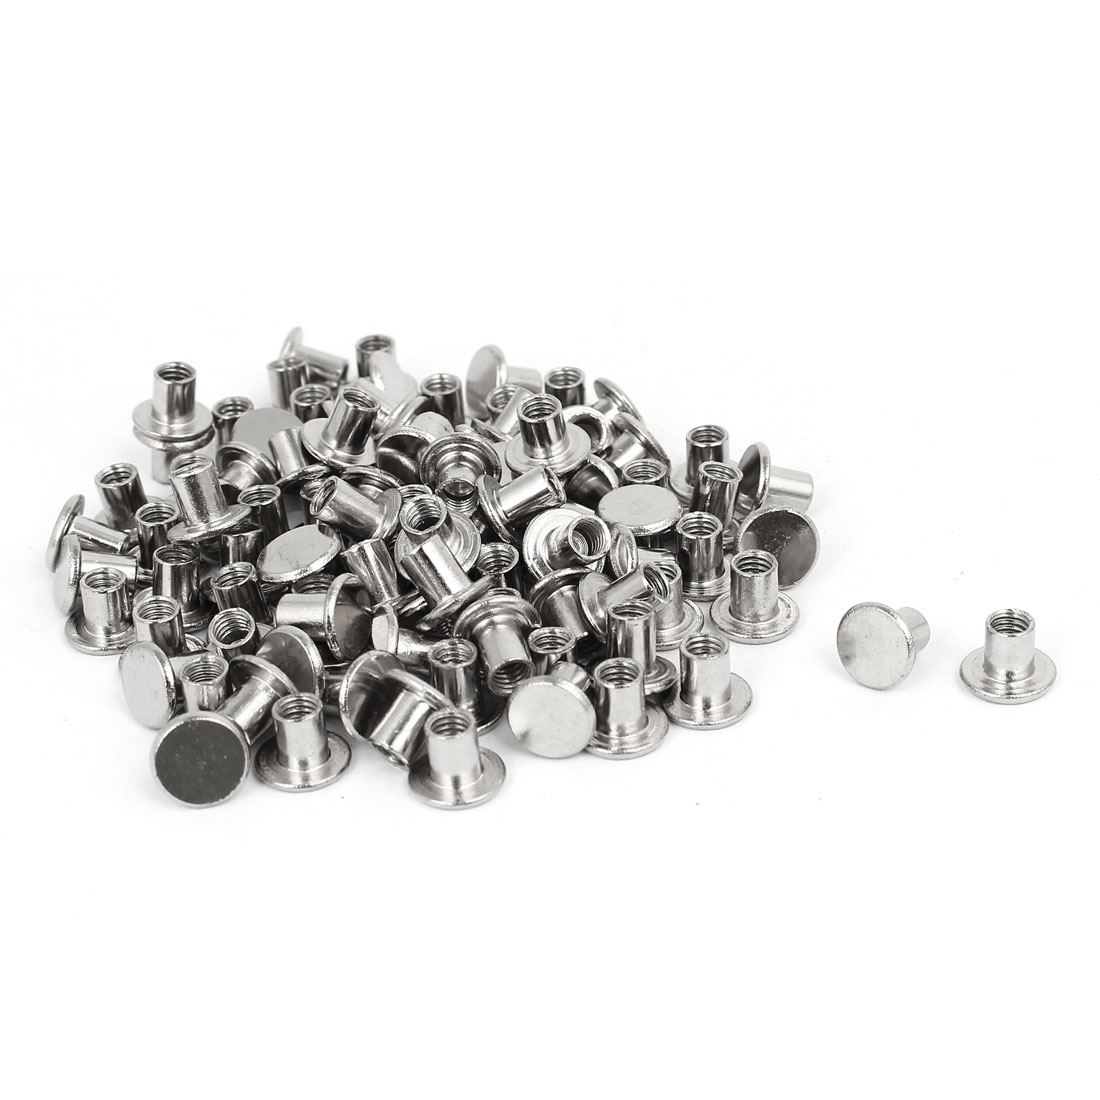 Photo Album Metal Nickel Plated Binding Screw Post Barrel Nut 5mmx6mm 100pcs